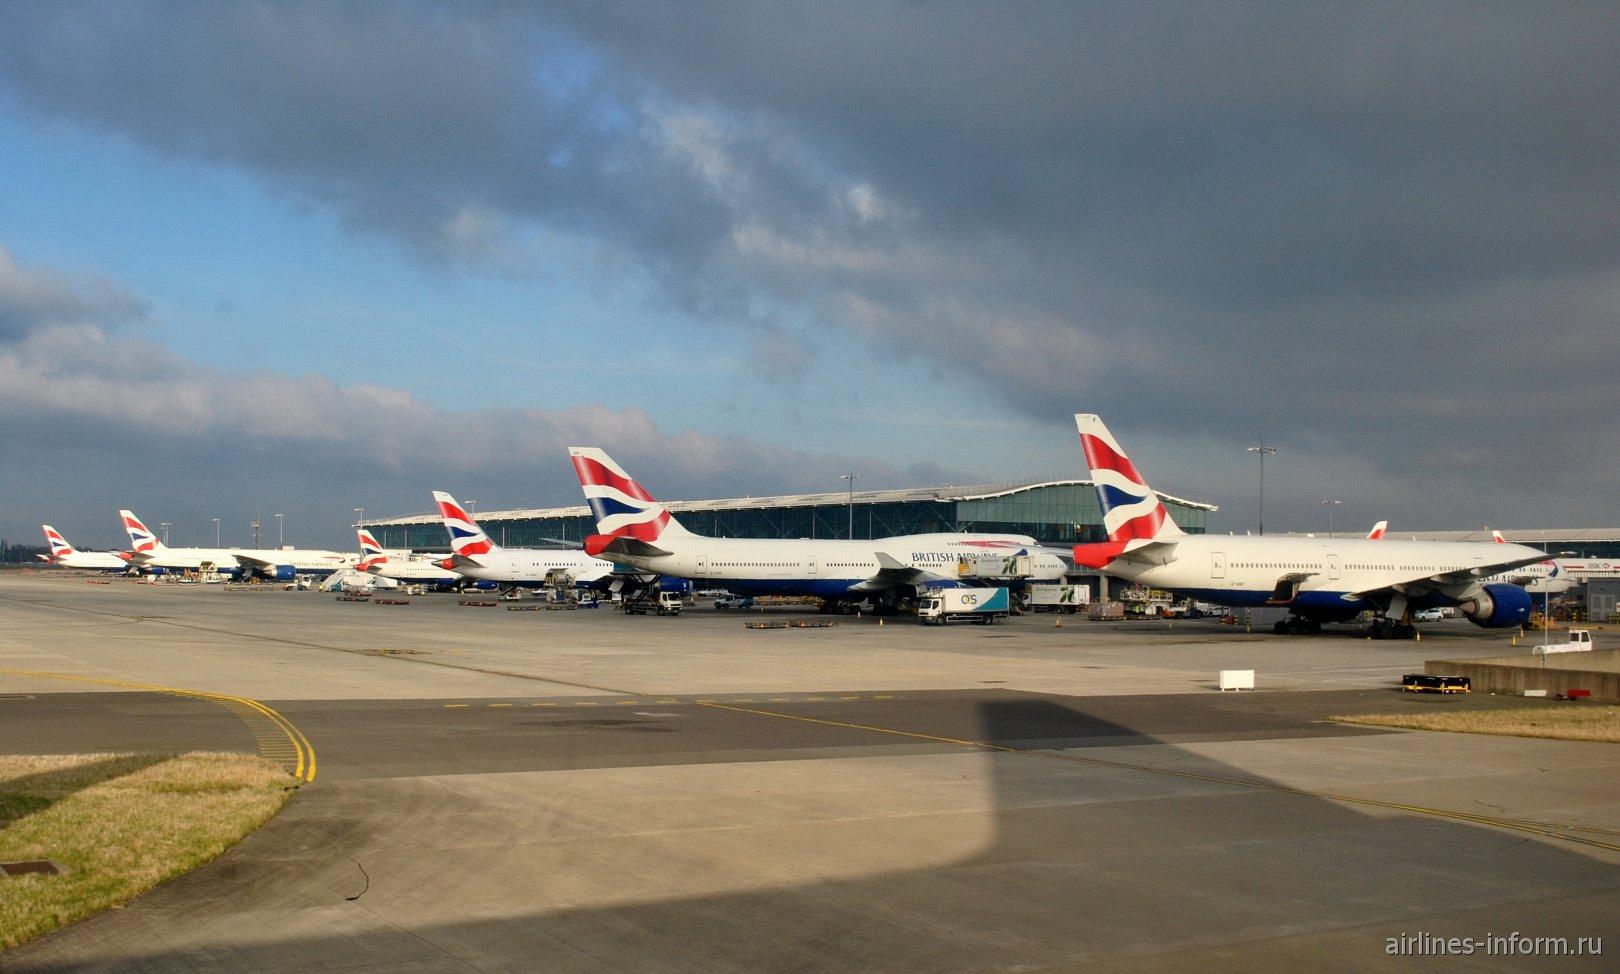 Самолеты Британских авиалиний у терминала T5B аэропорта Лондон Хитроу